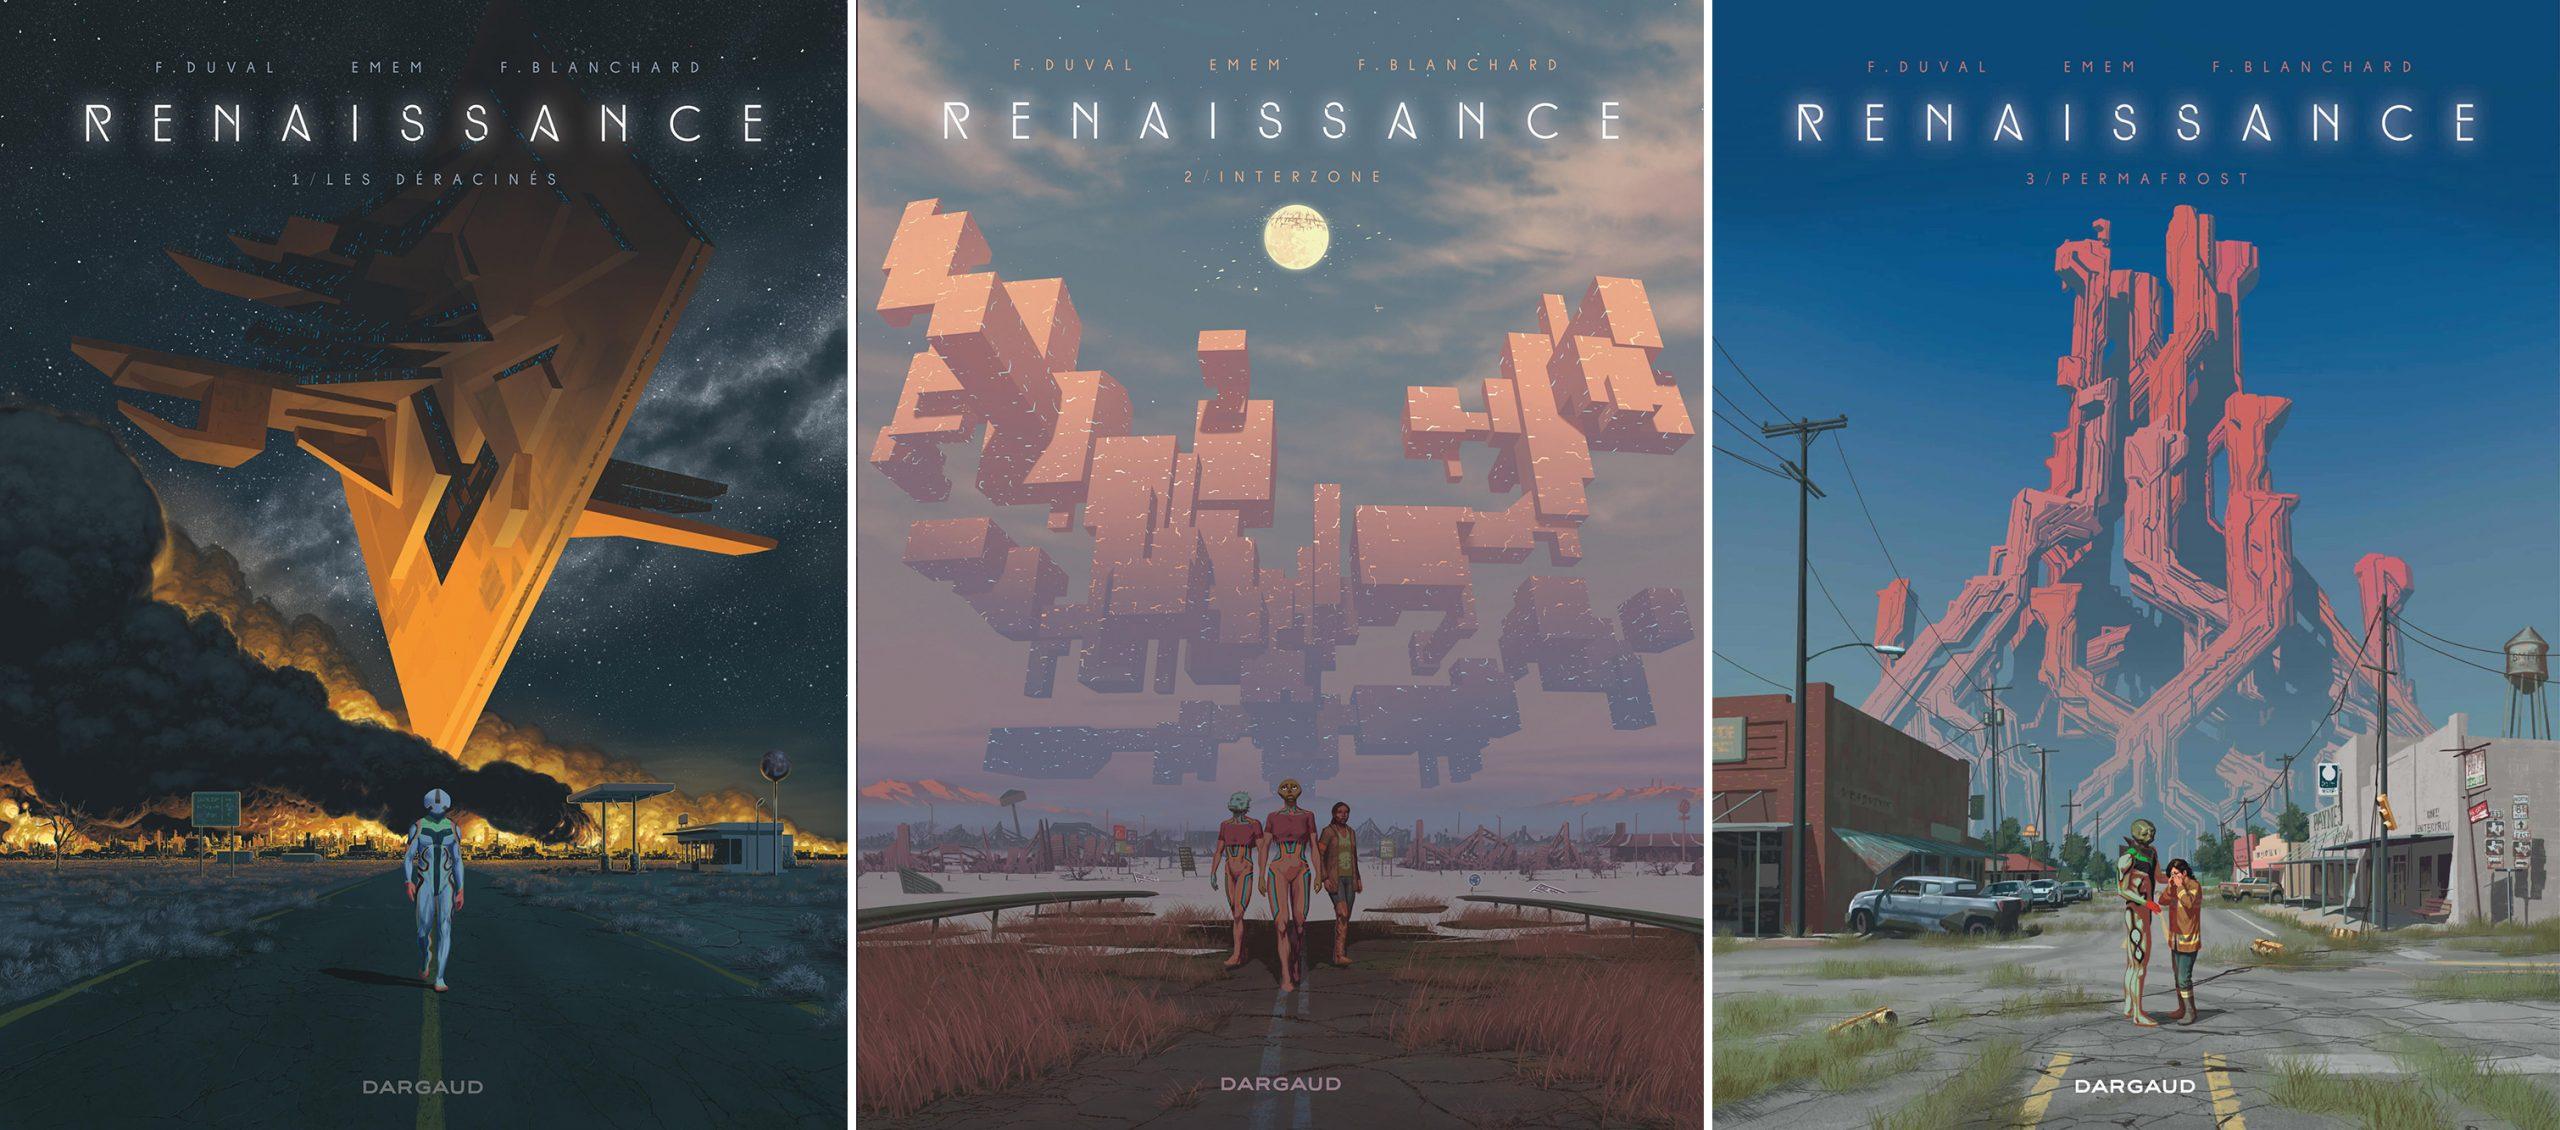 Renaissance, tomes 1-3